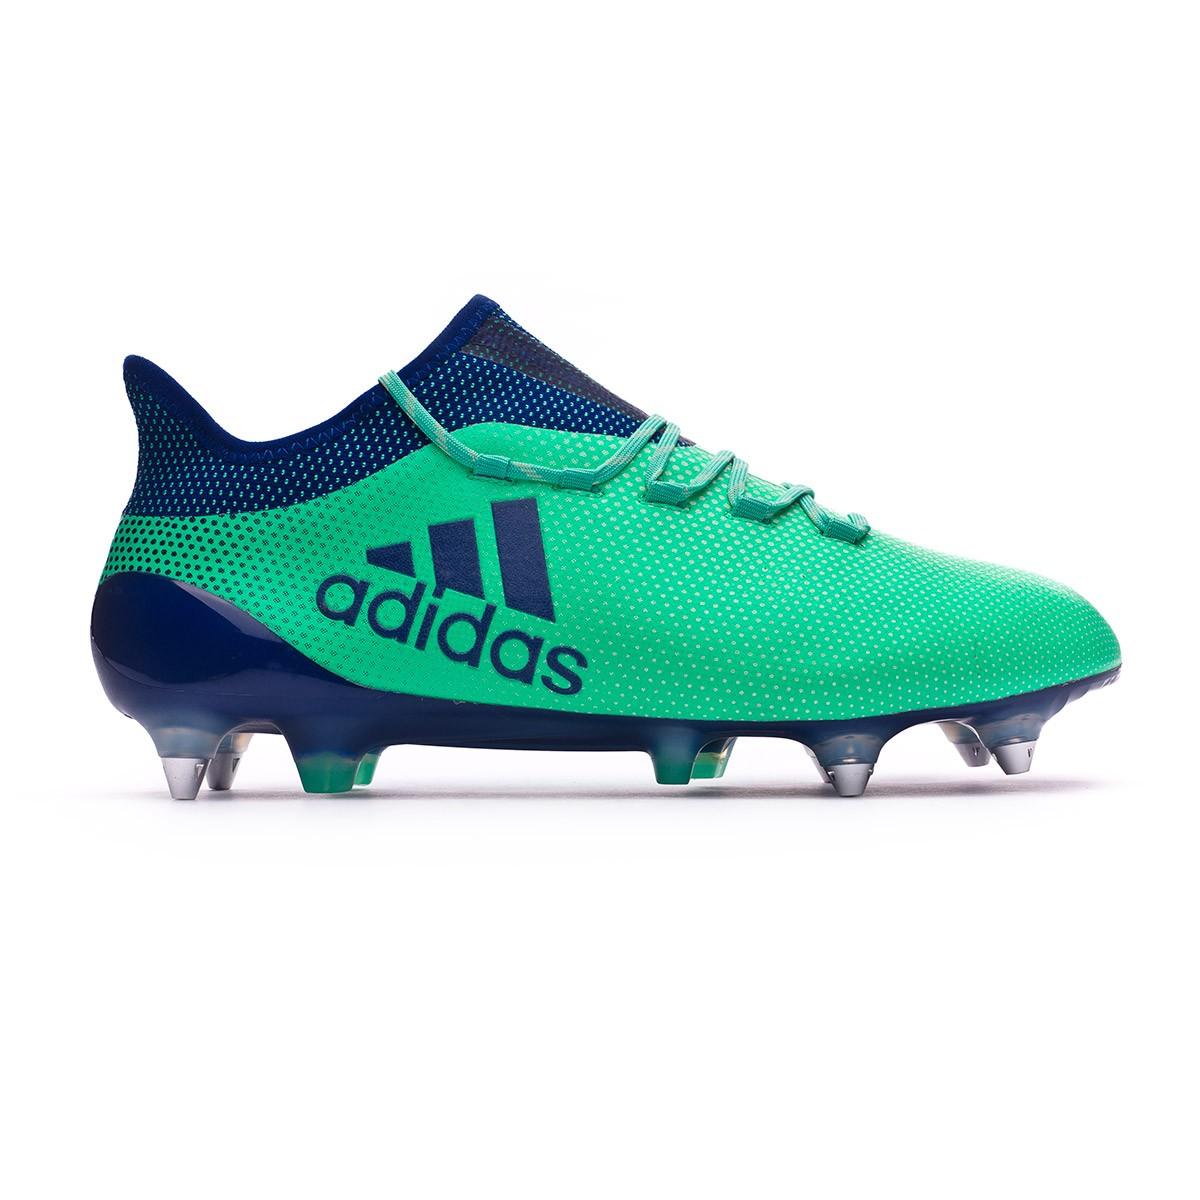 9c620df875b1 Football Boots adidas X 17.1 SG Aero green-Unity ink-Hi-res green - Tienda  de fútbol Fútbol Emotion